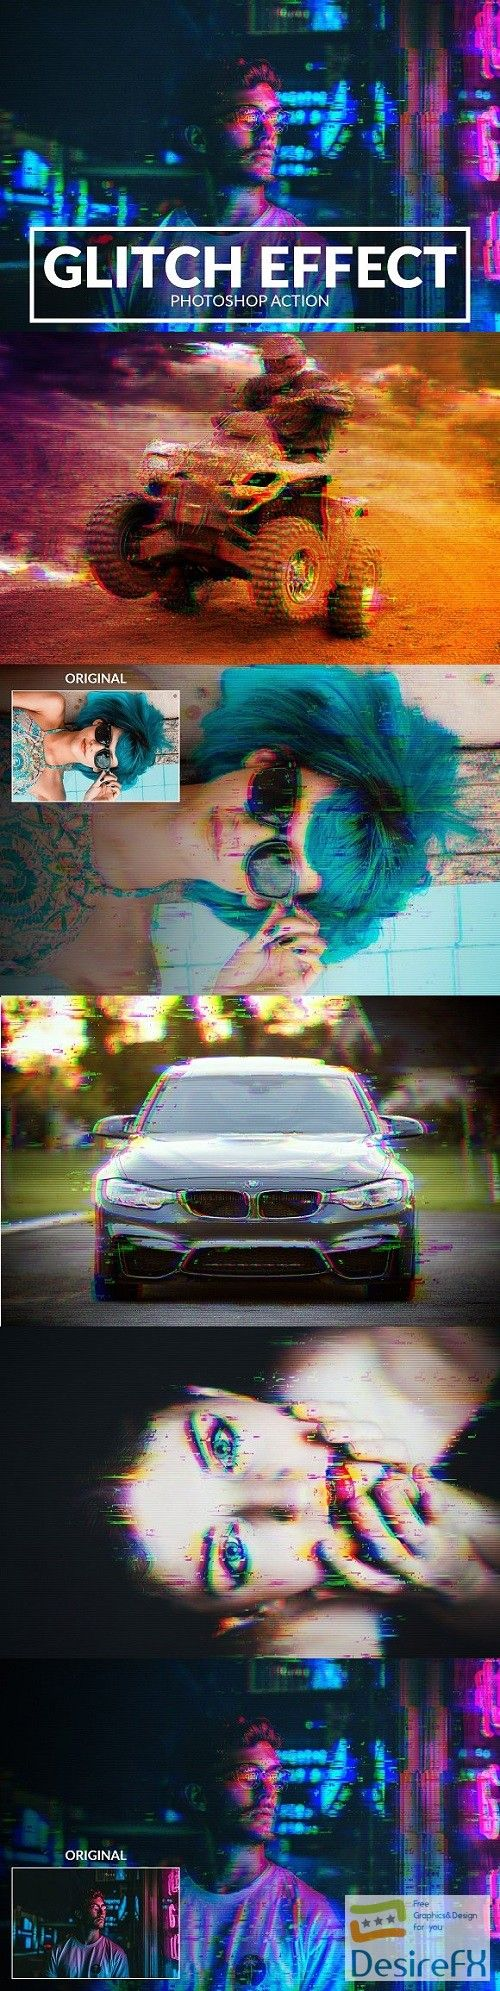 Glitch Photoshop Action 2273479